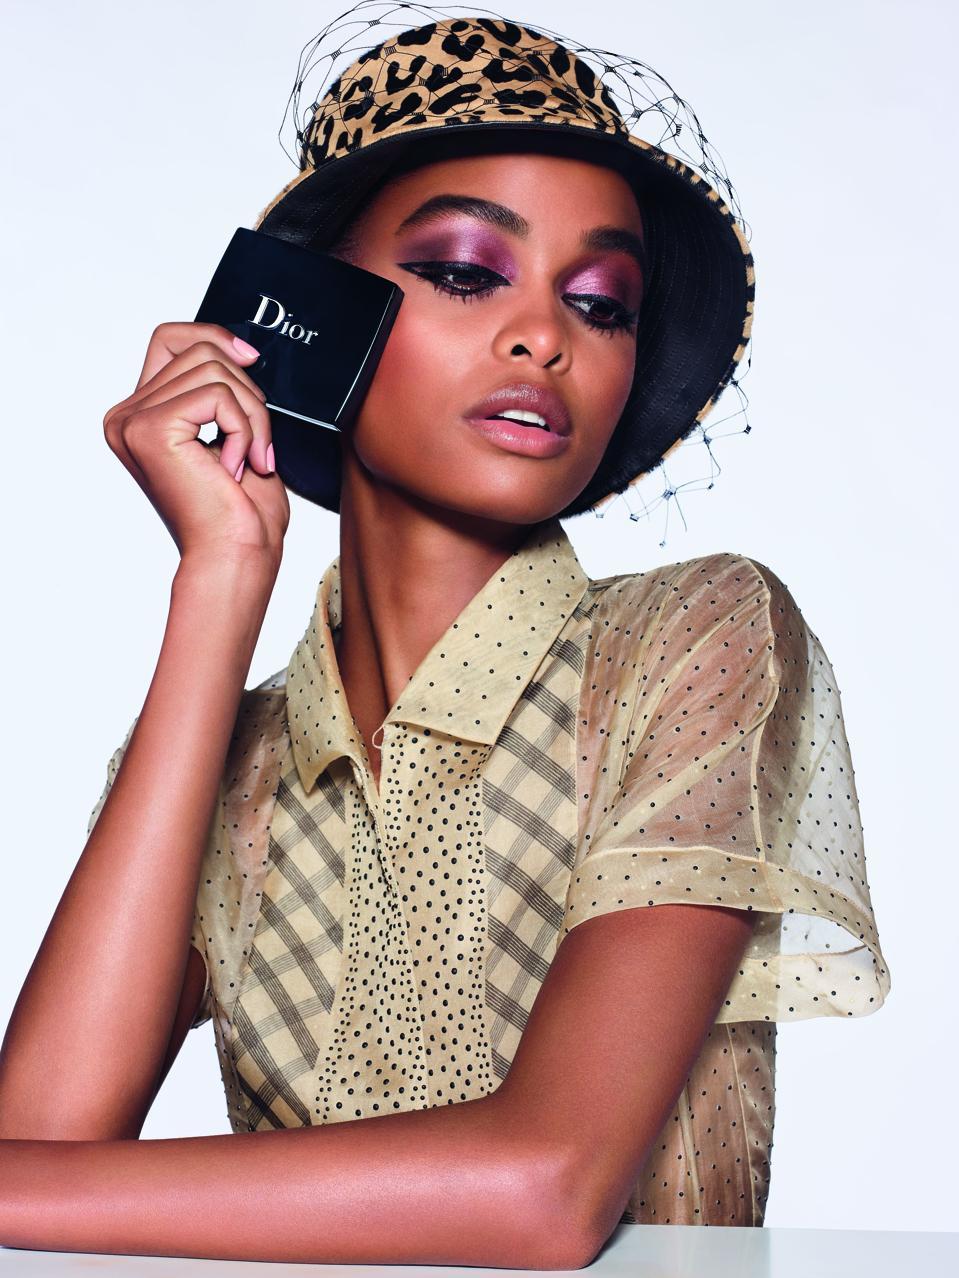 Celebrity Beauty: Dior Beauty 2020